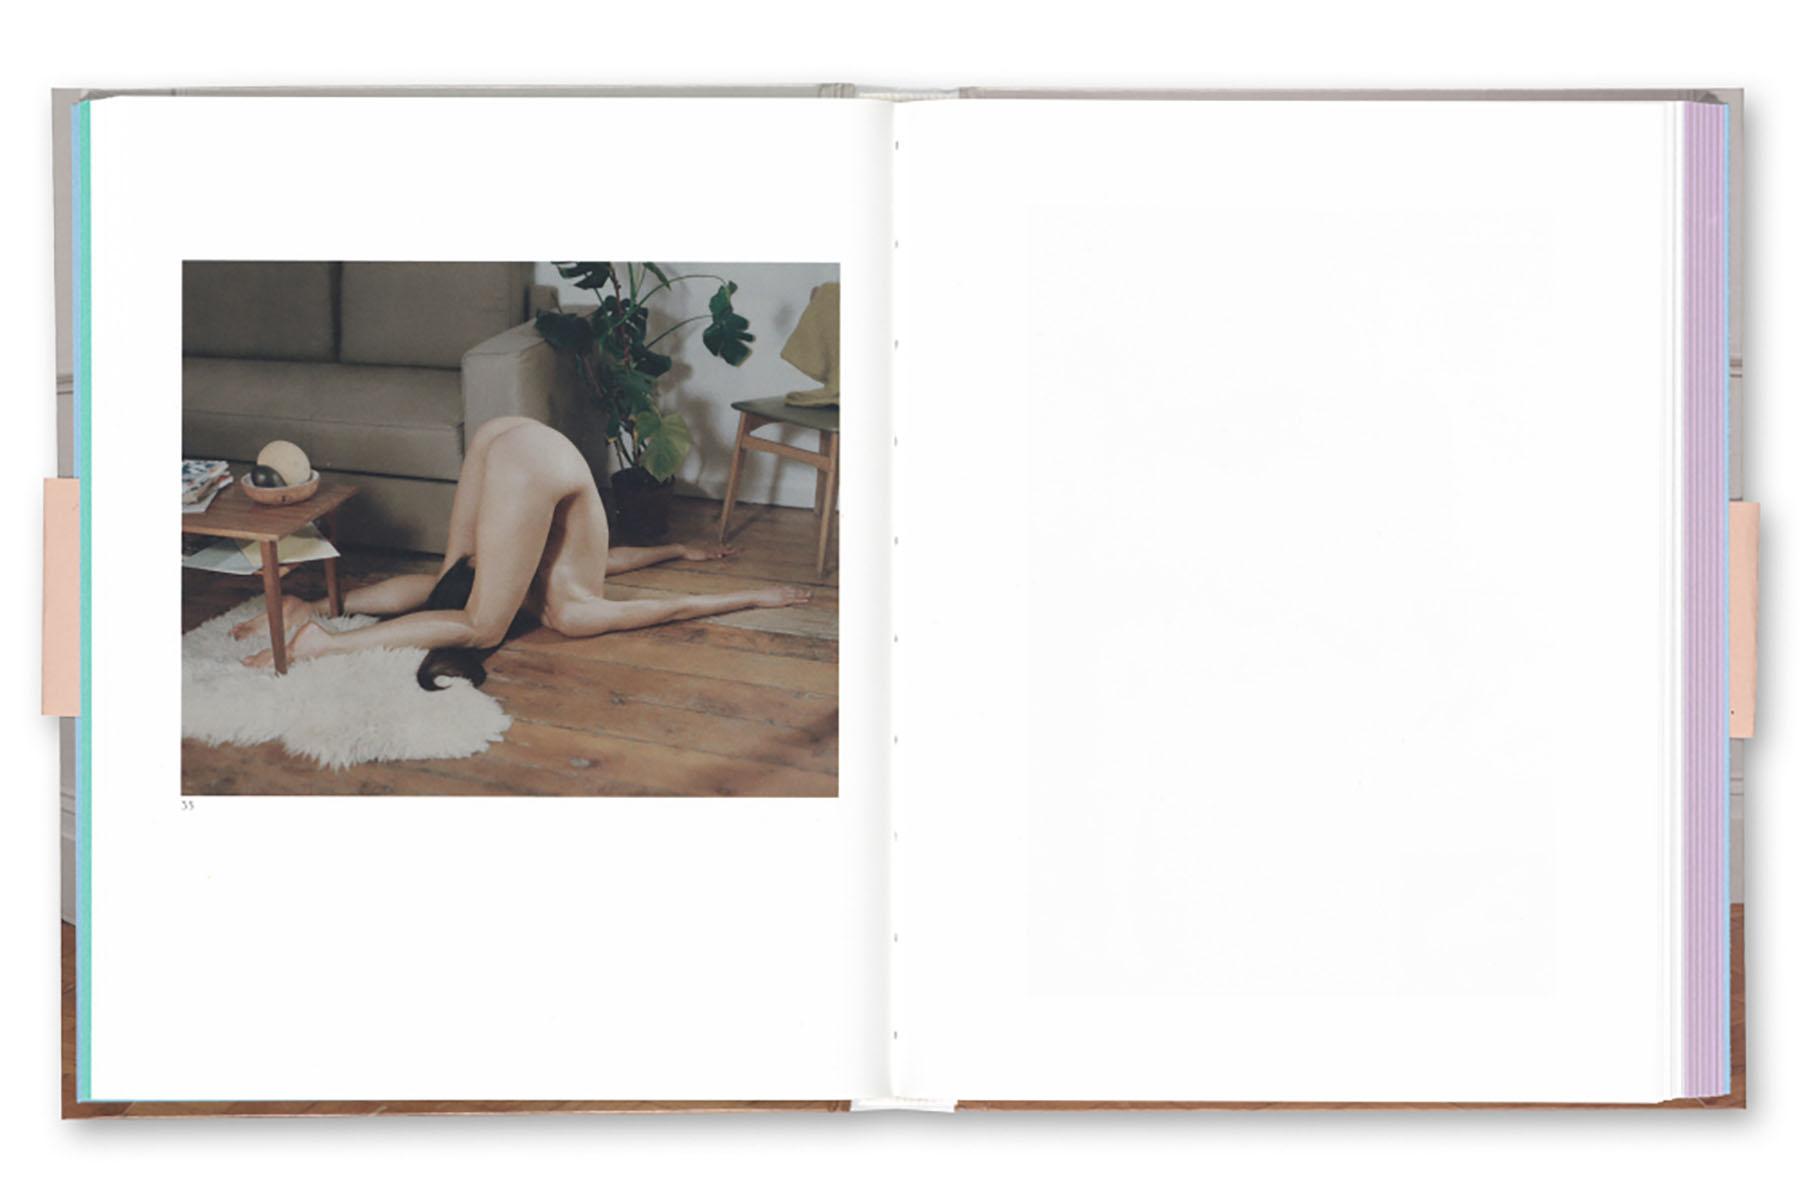 iGNANT-Print-Posturing-006